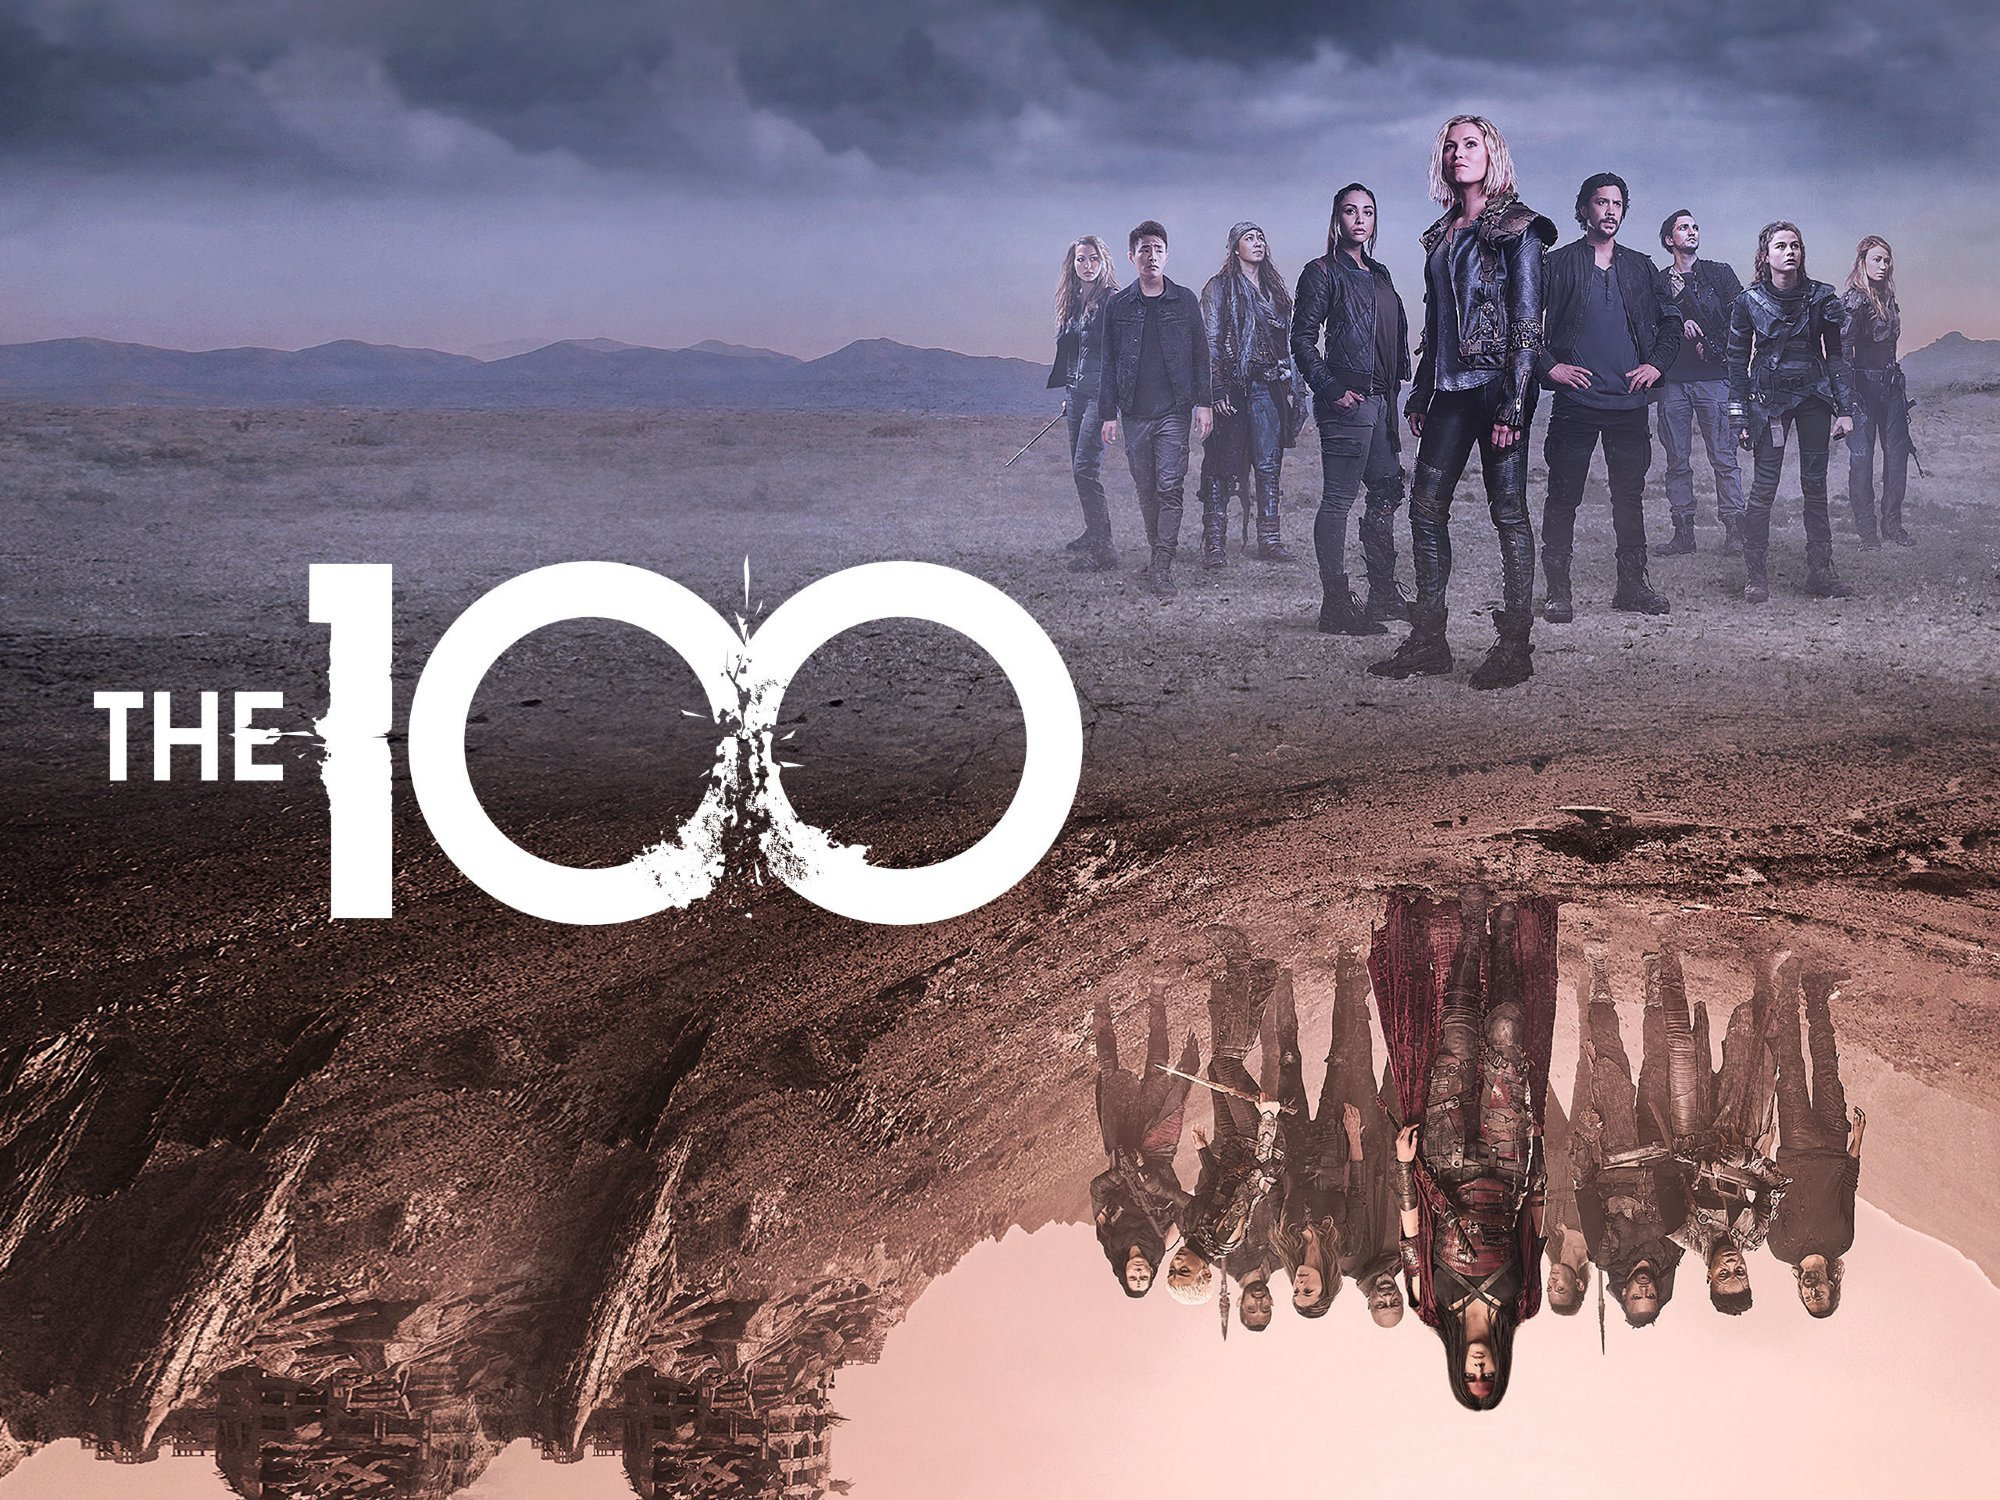 Amazon co uk: Watch The 100: Season 5 | Prime Video